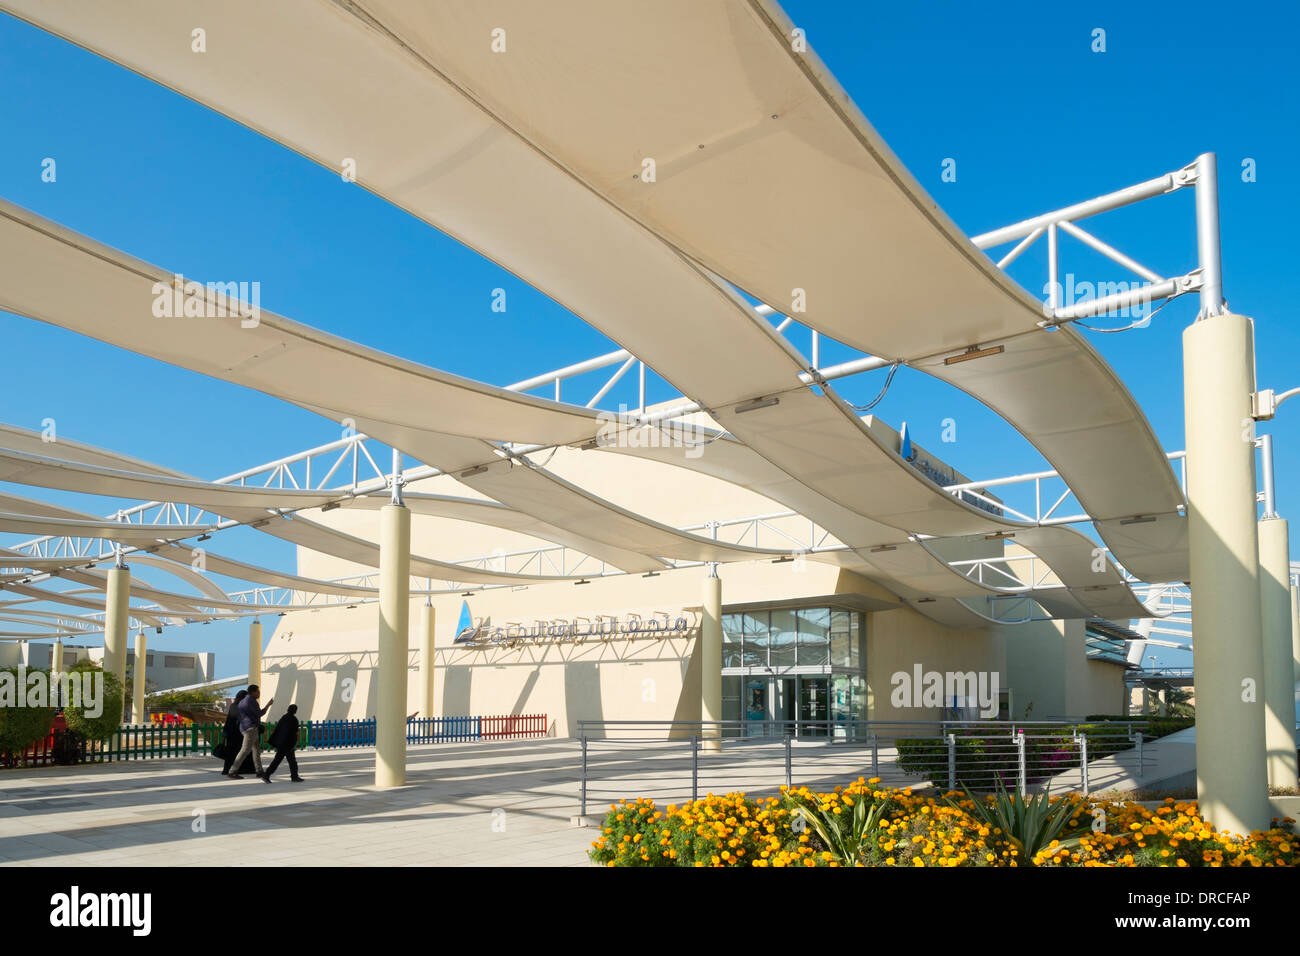 New maritime museum in Sharjah in United Arab Emirates - Stock Image